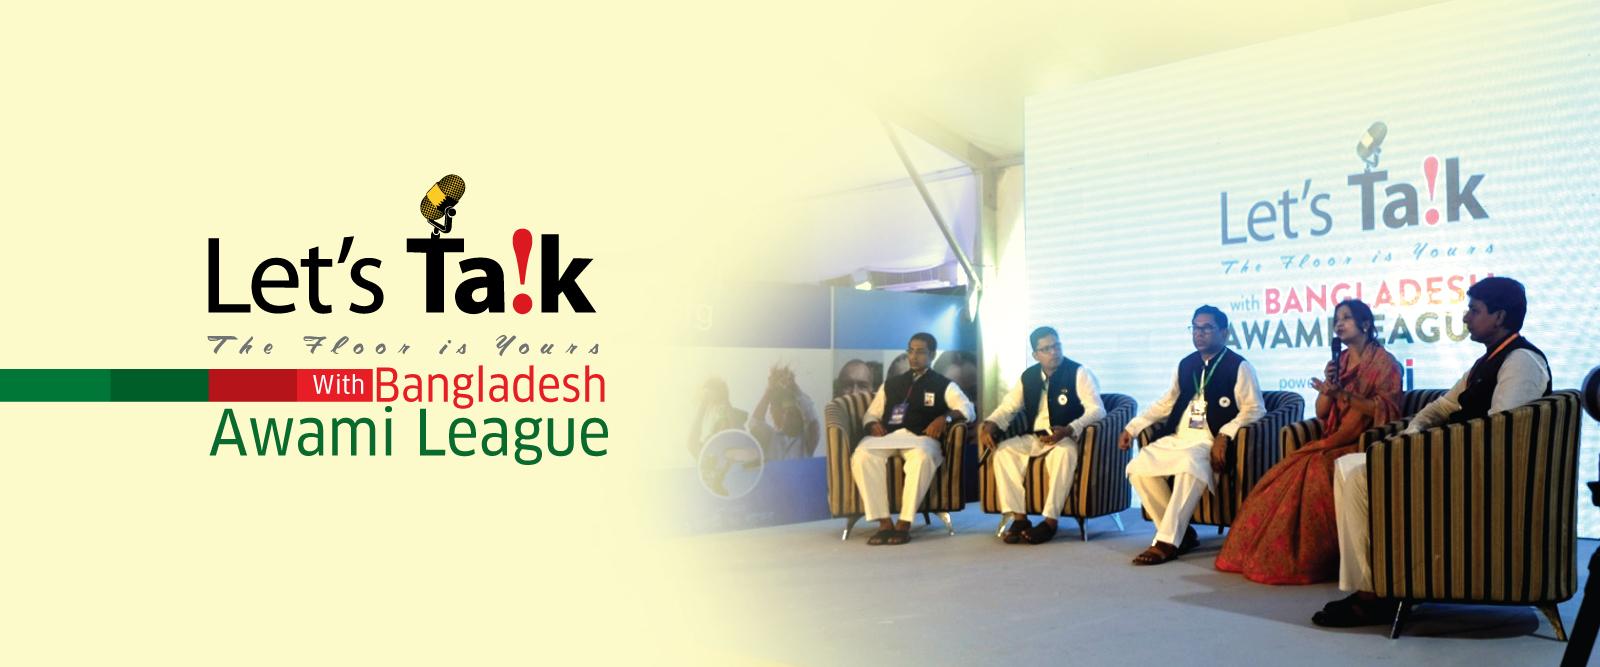 Let's Ta!k with Bangladesh Awami League